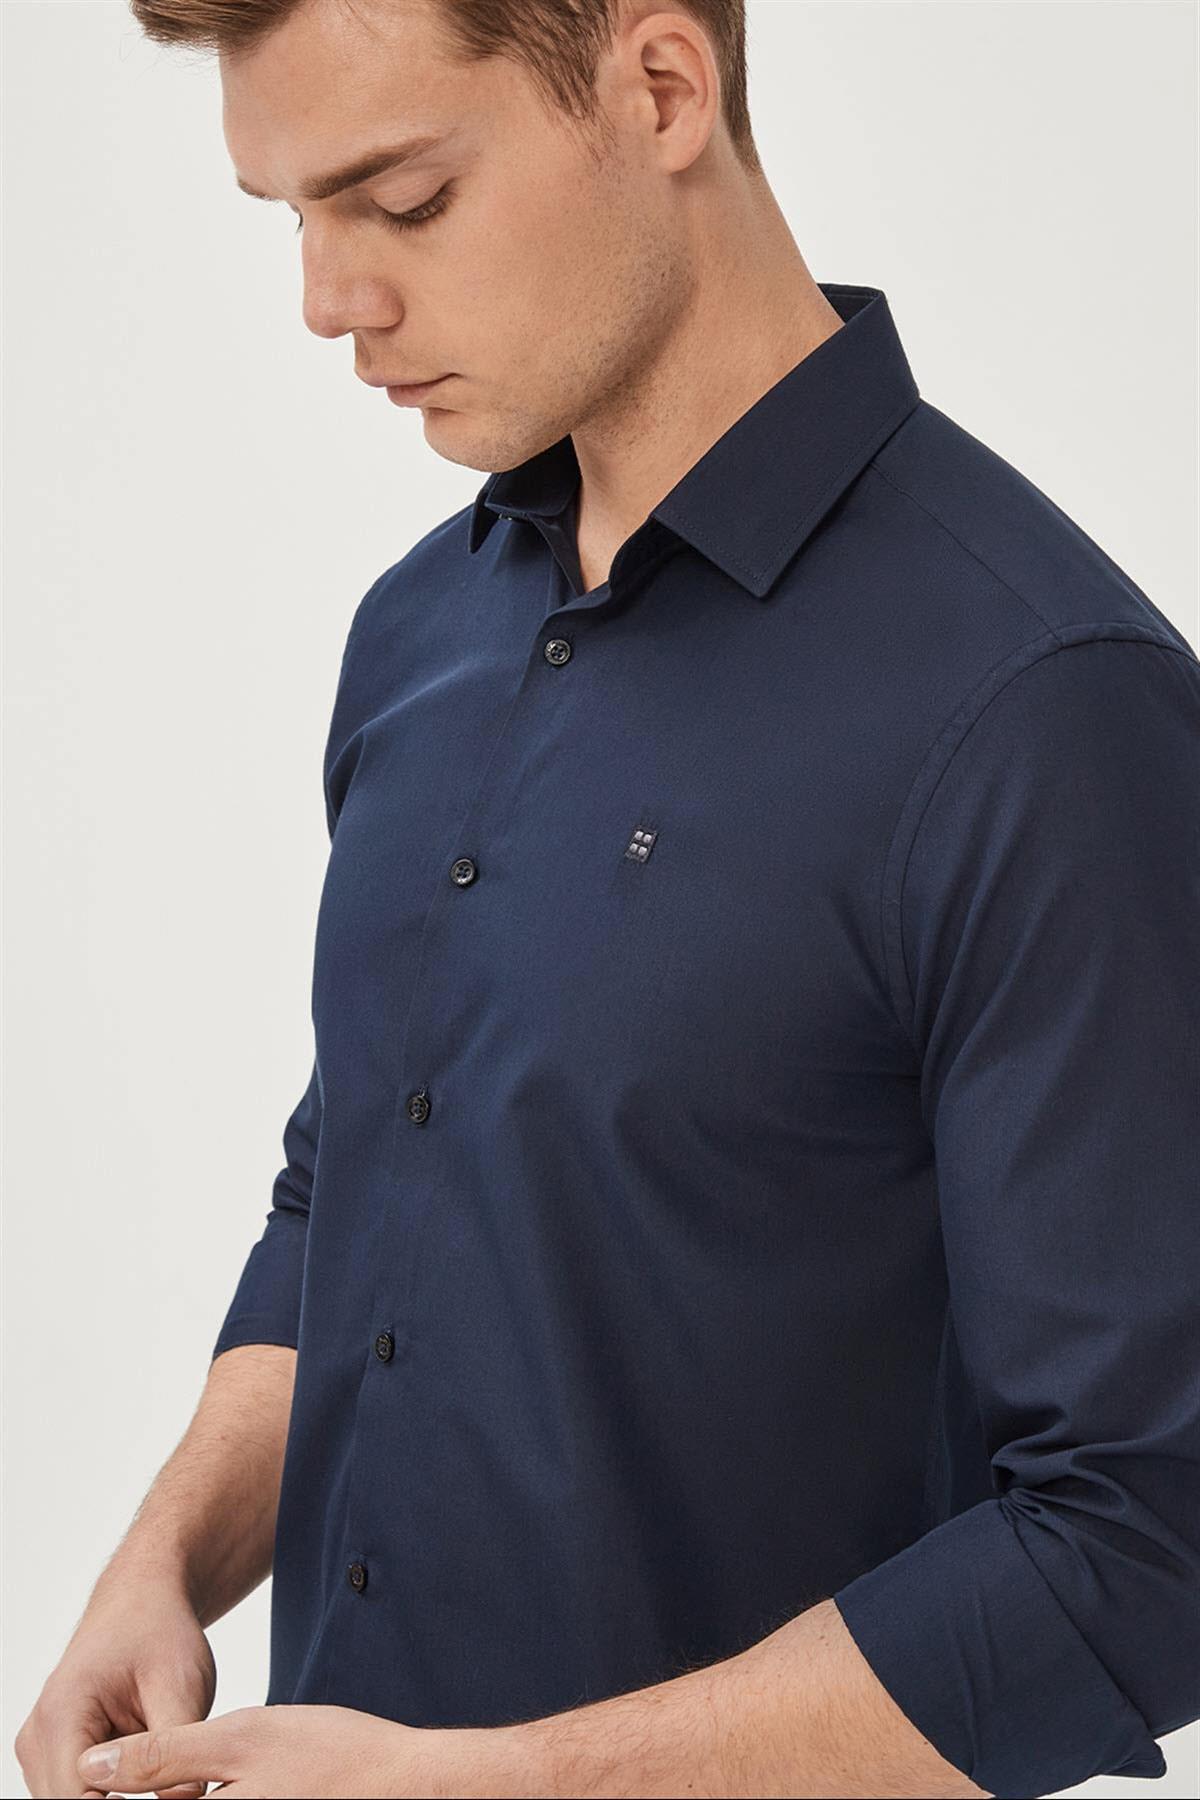 Avva Erkek Lacivert Düz Klasik Yaka Slim Fit Gömlek E002002 2